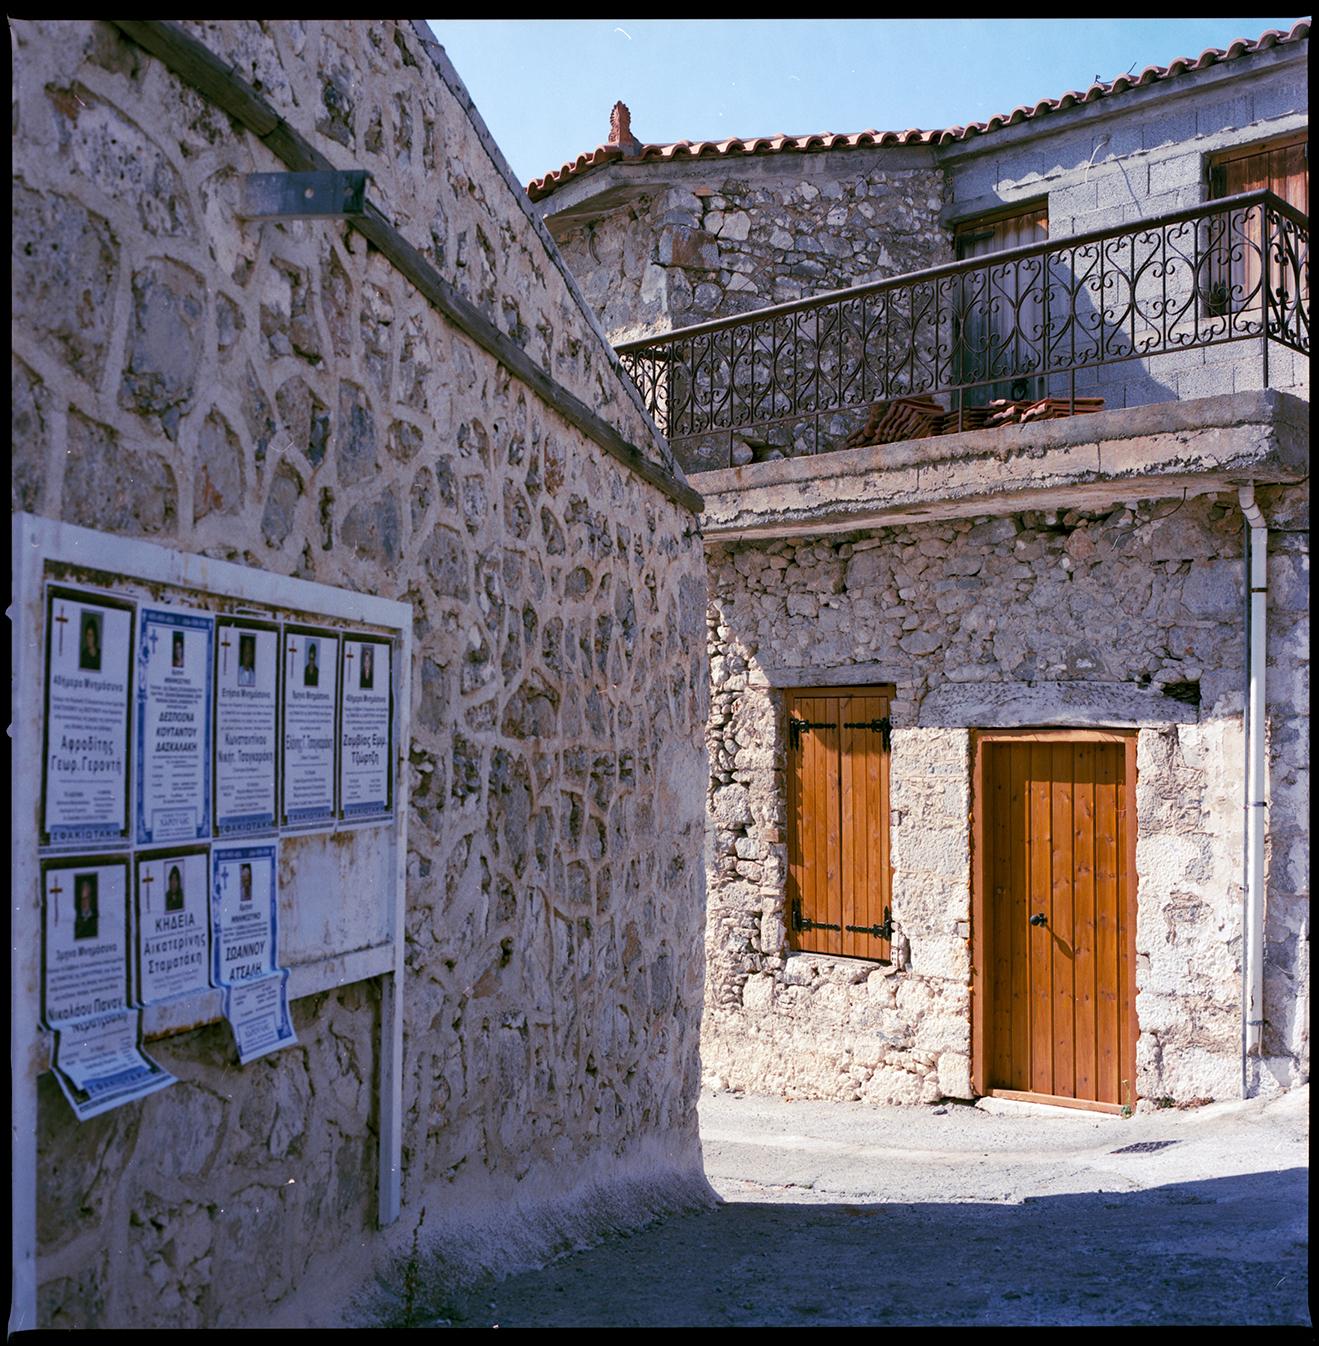 Small alleyway between stone houses in Crete